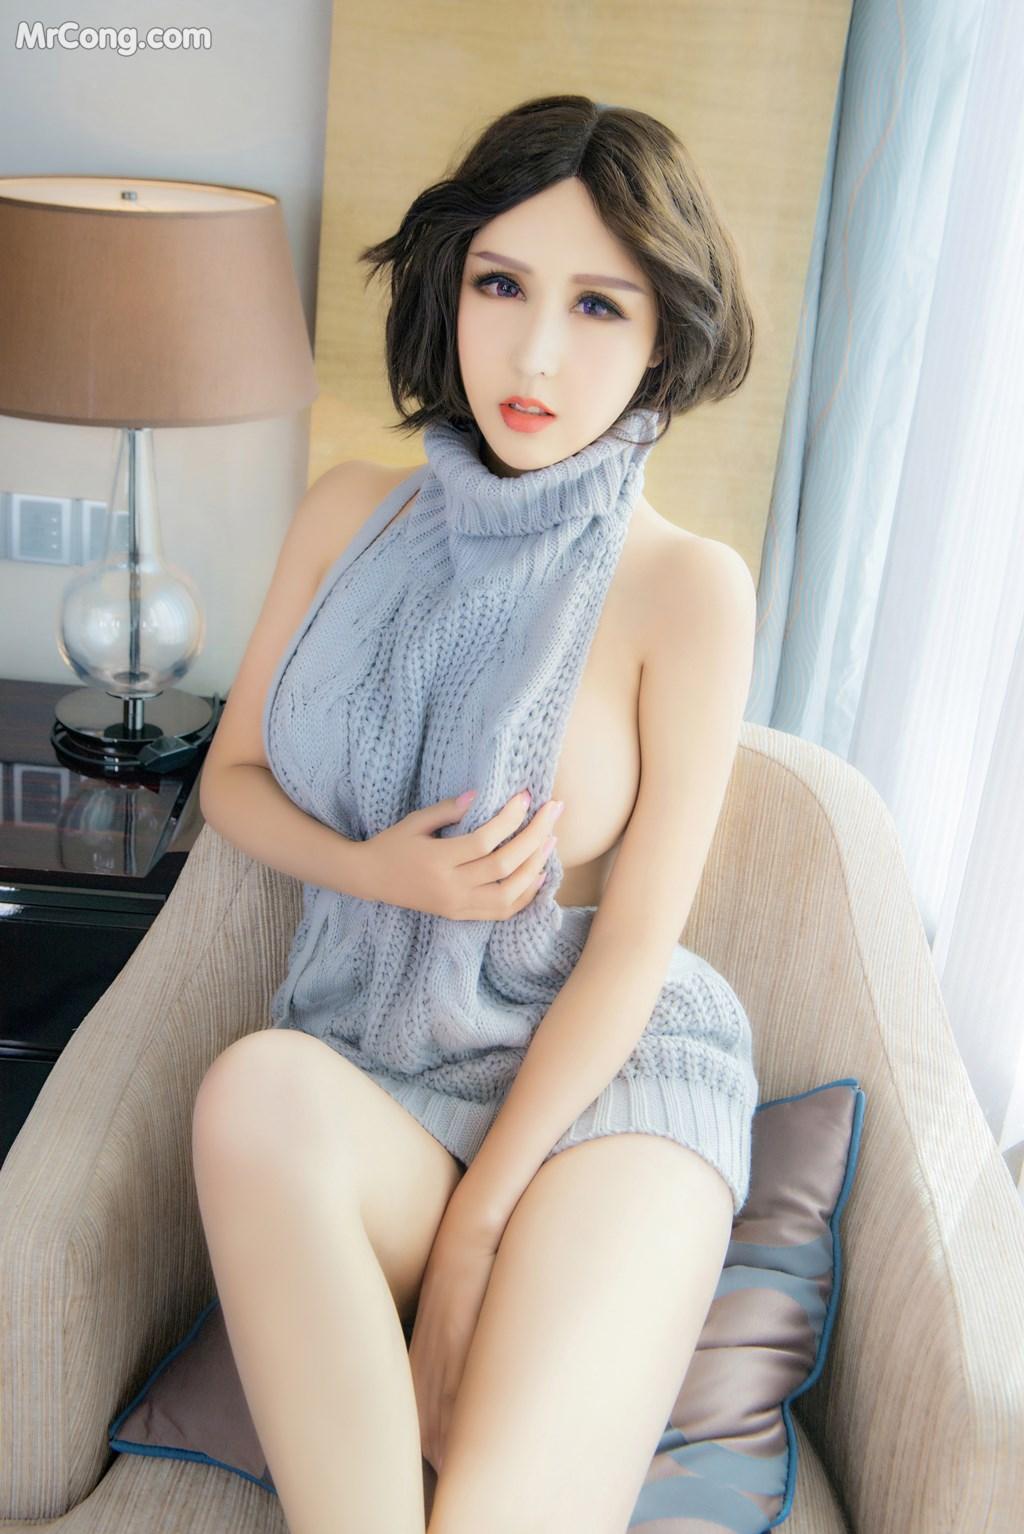 Image SLADY-2017-05-27-No.011-Na-Yi-Ling-Er-MrCong.com-010 in post SLADY 2017-05-27 No.011: Người mẫu Na Yi Ling Er (娜依灵儿) (54 ảnh)